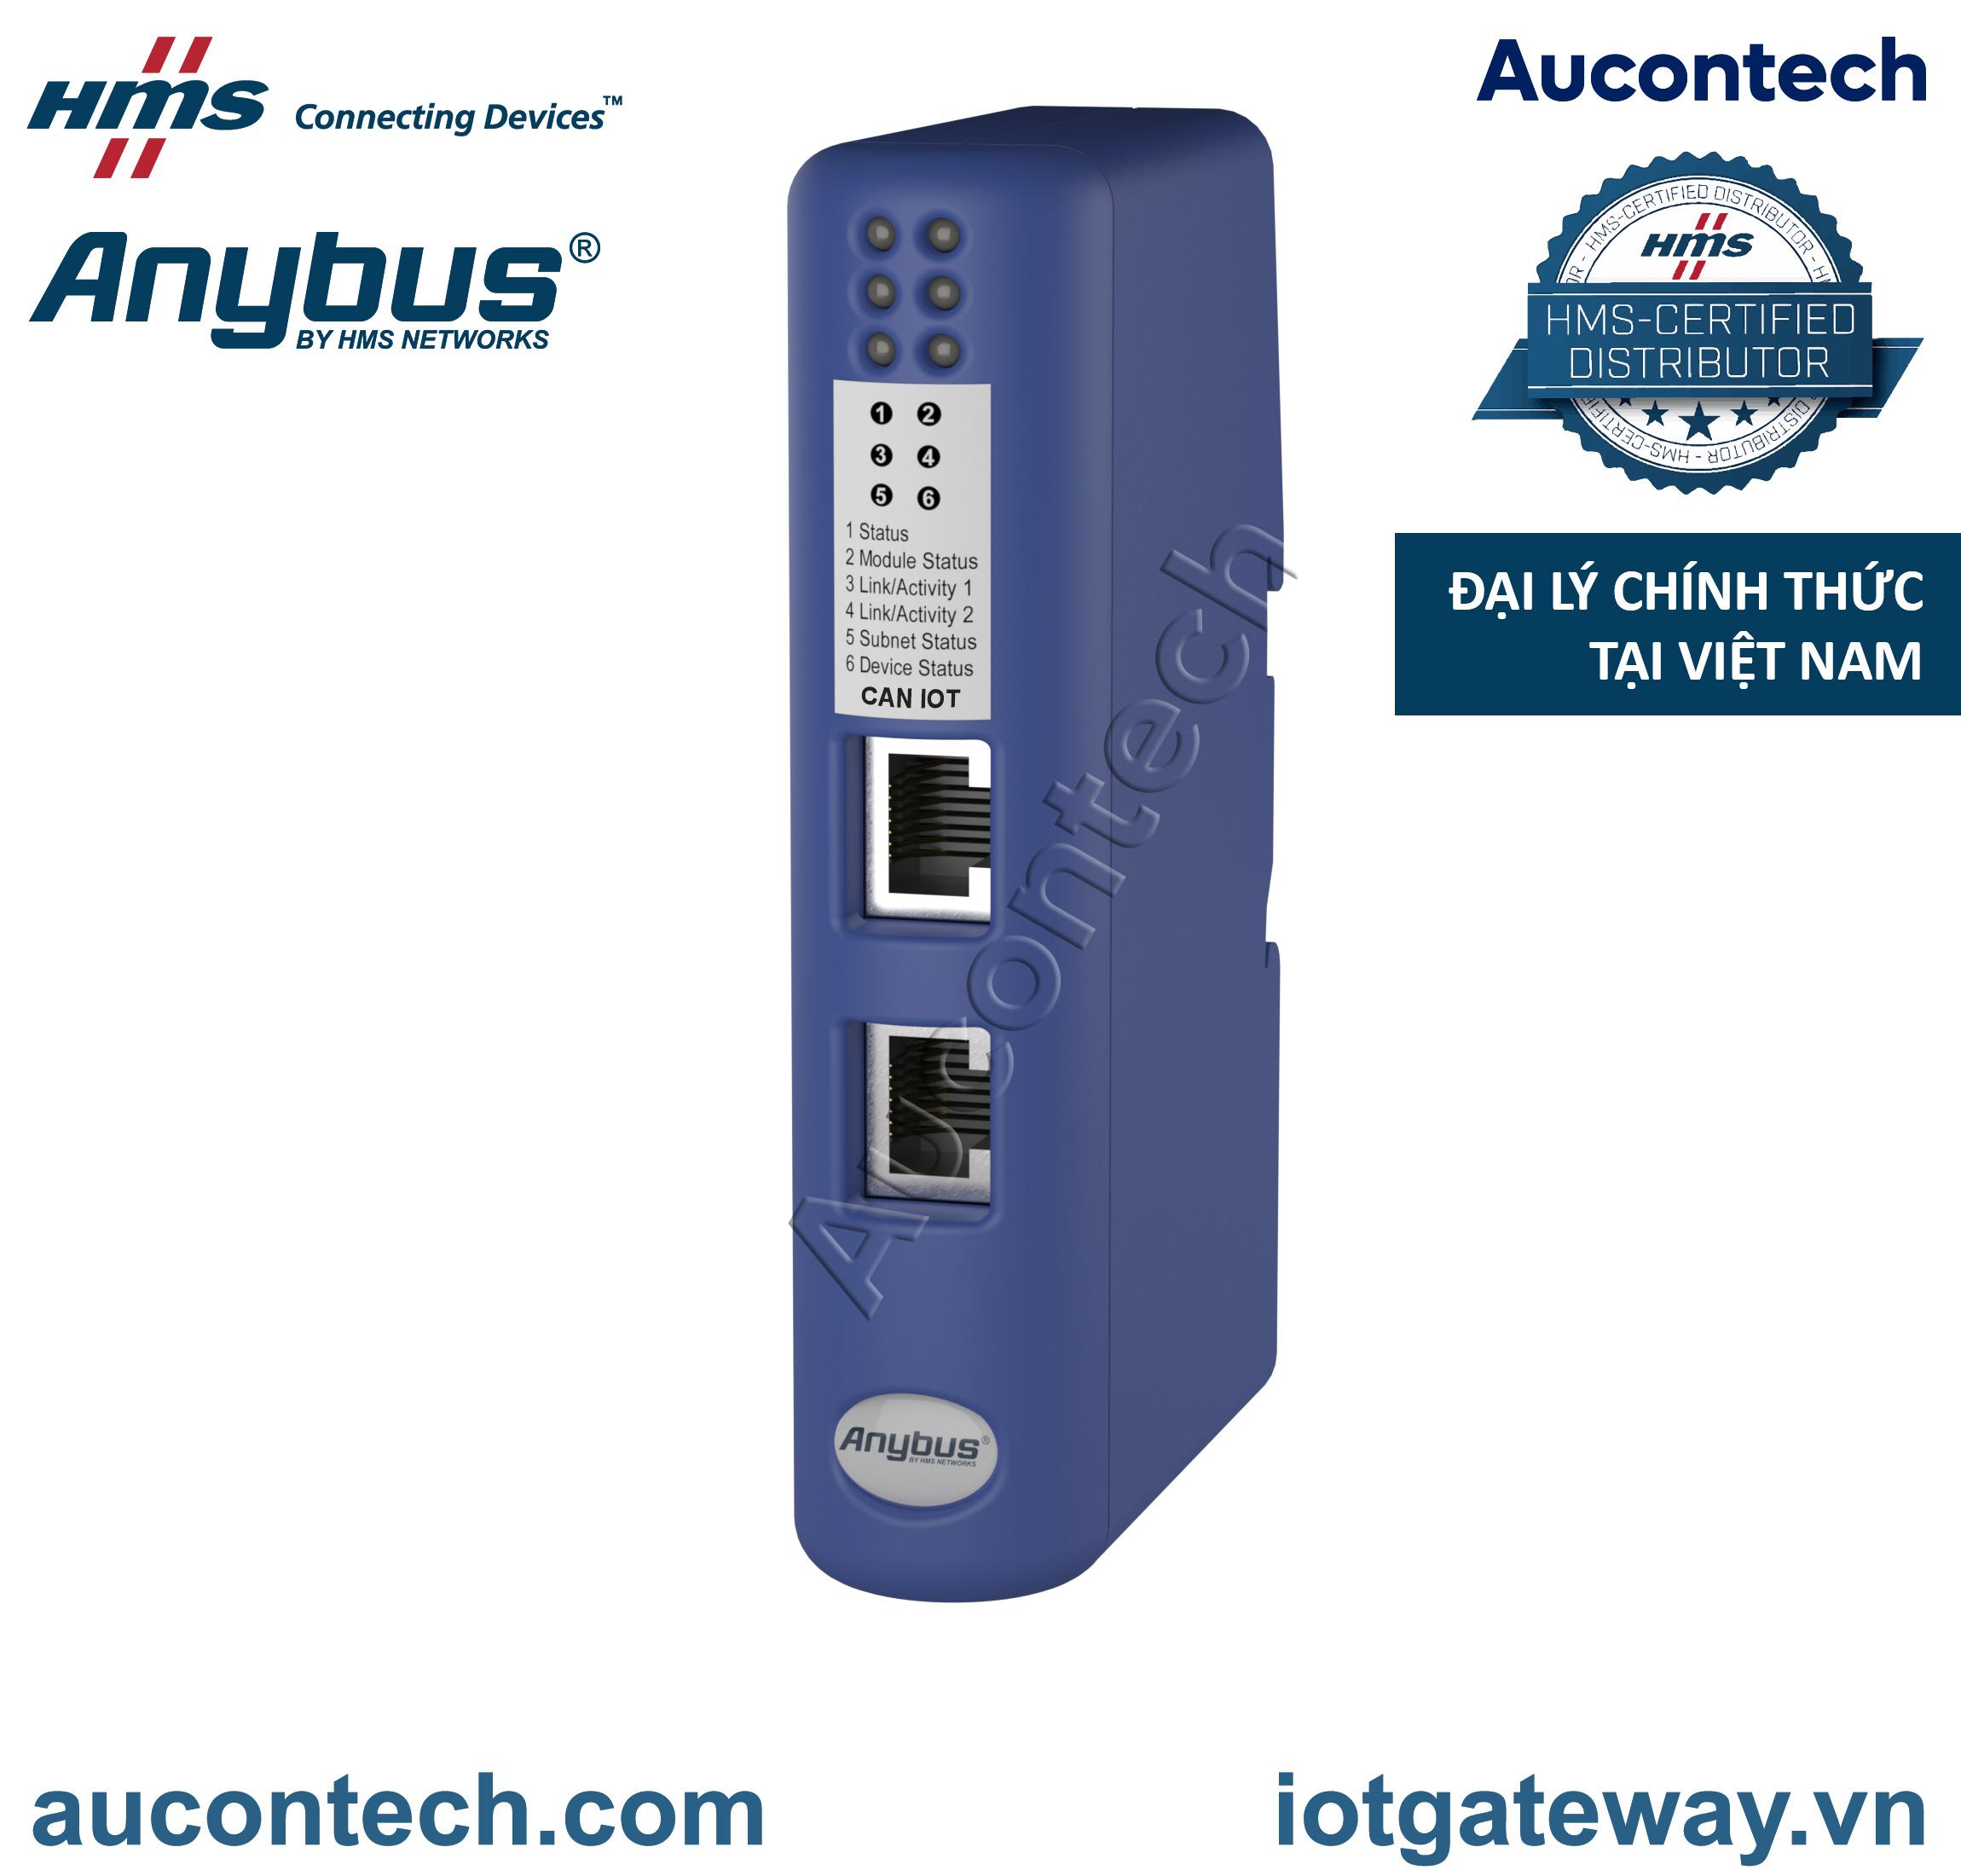 Anybus Communicator CAN - IIoT MQTT and OPC-UA - AB7330 - Anybus Vietnam